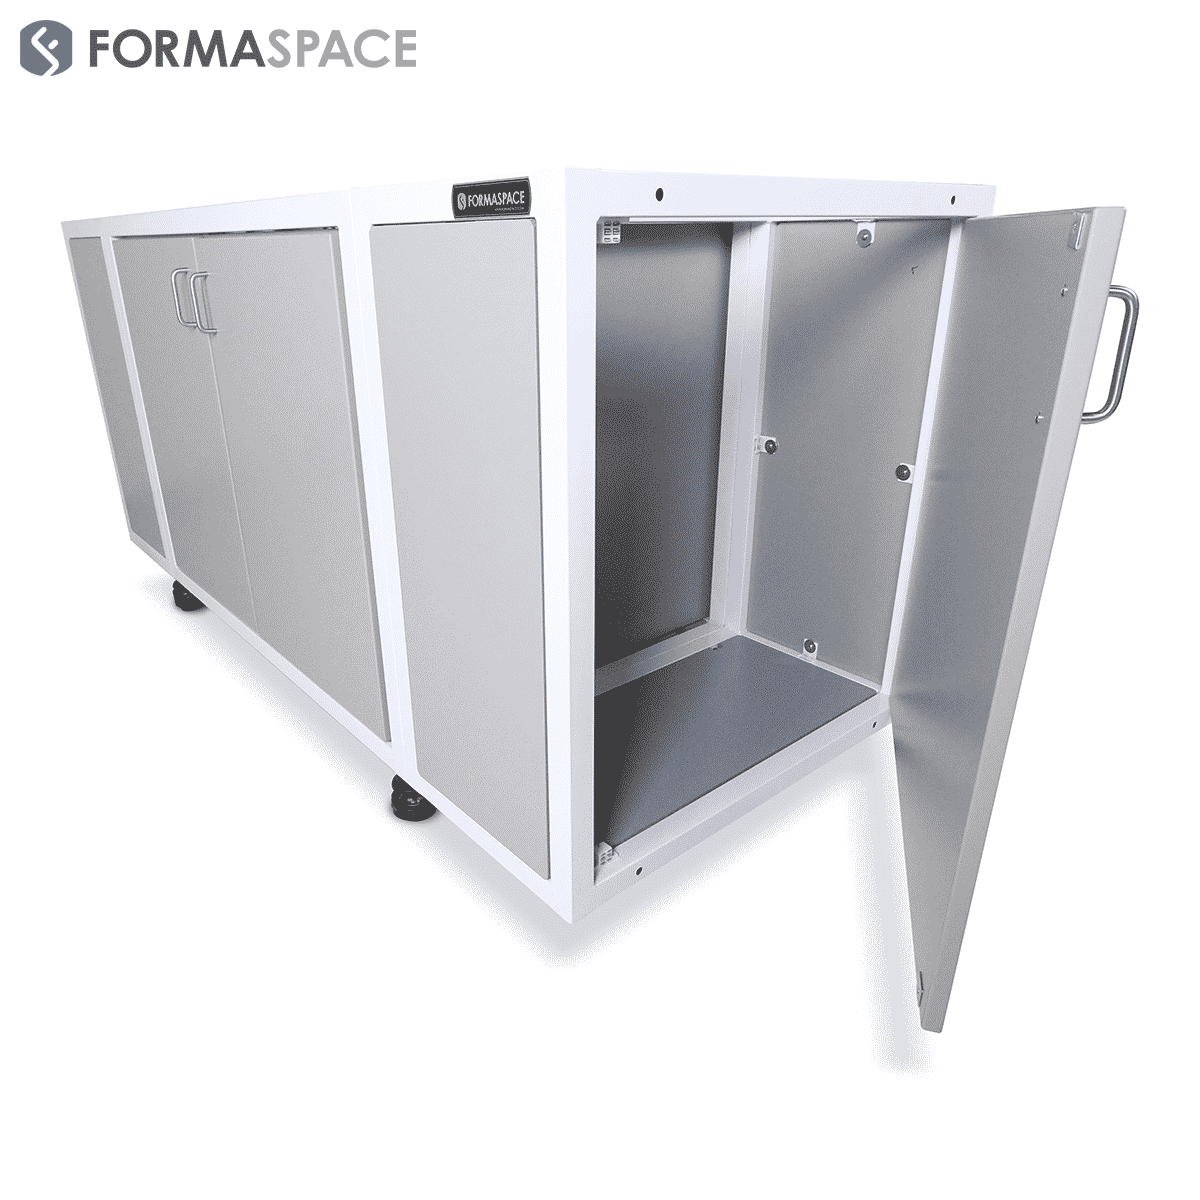 single-door detachable side cabinets